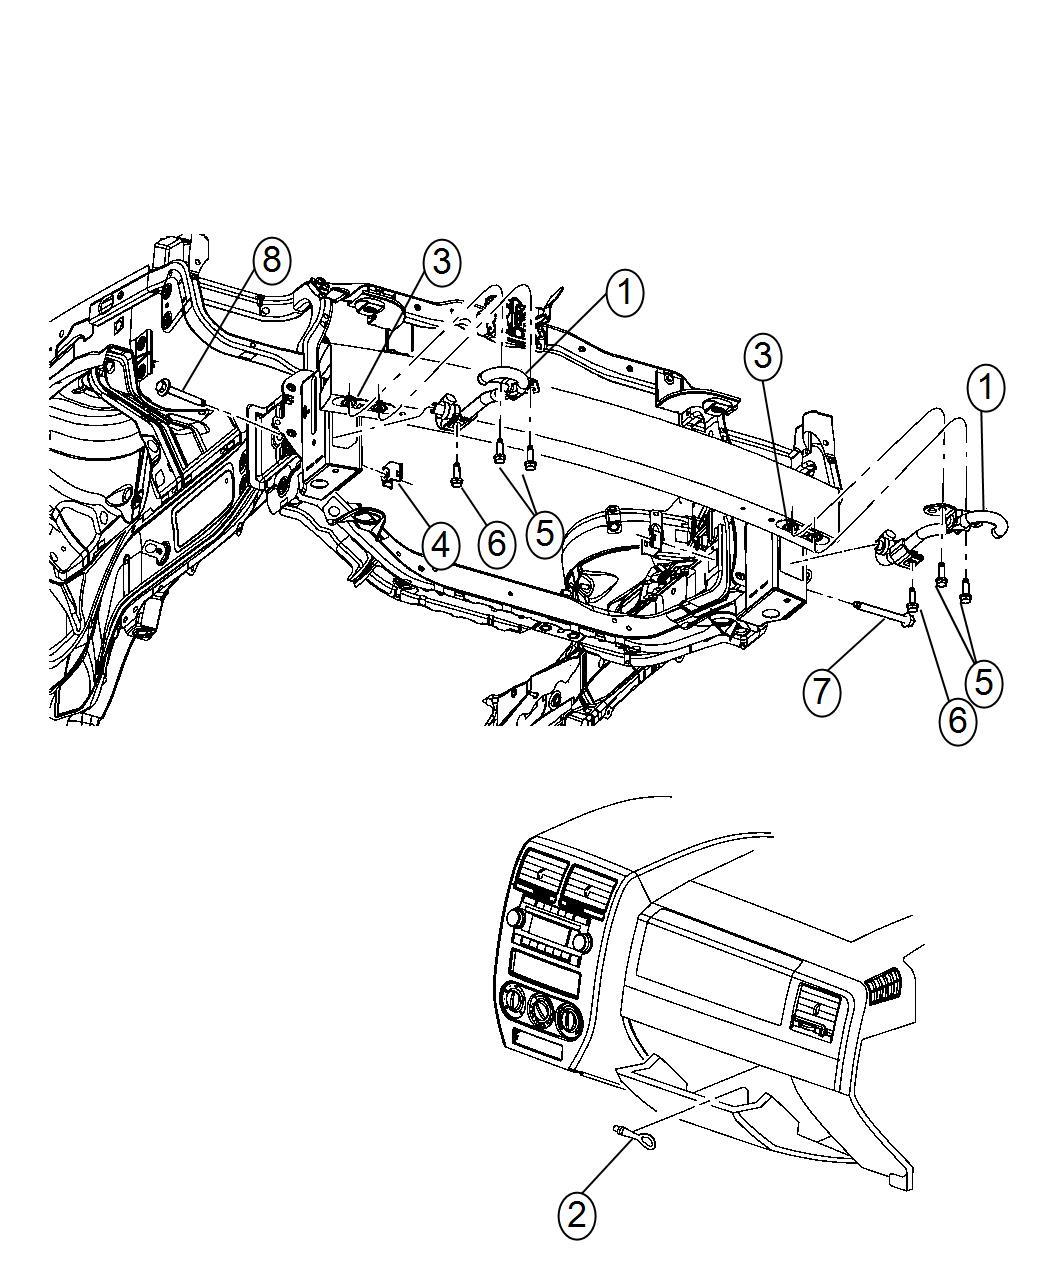 2017 Jeep Patriot Hook. Tow. [tow eye brackets